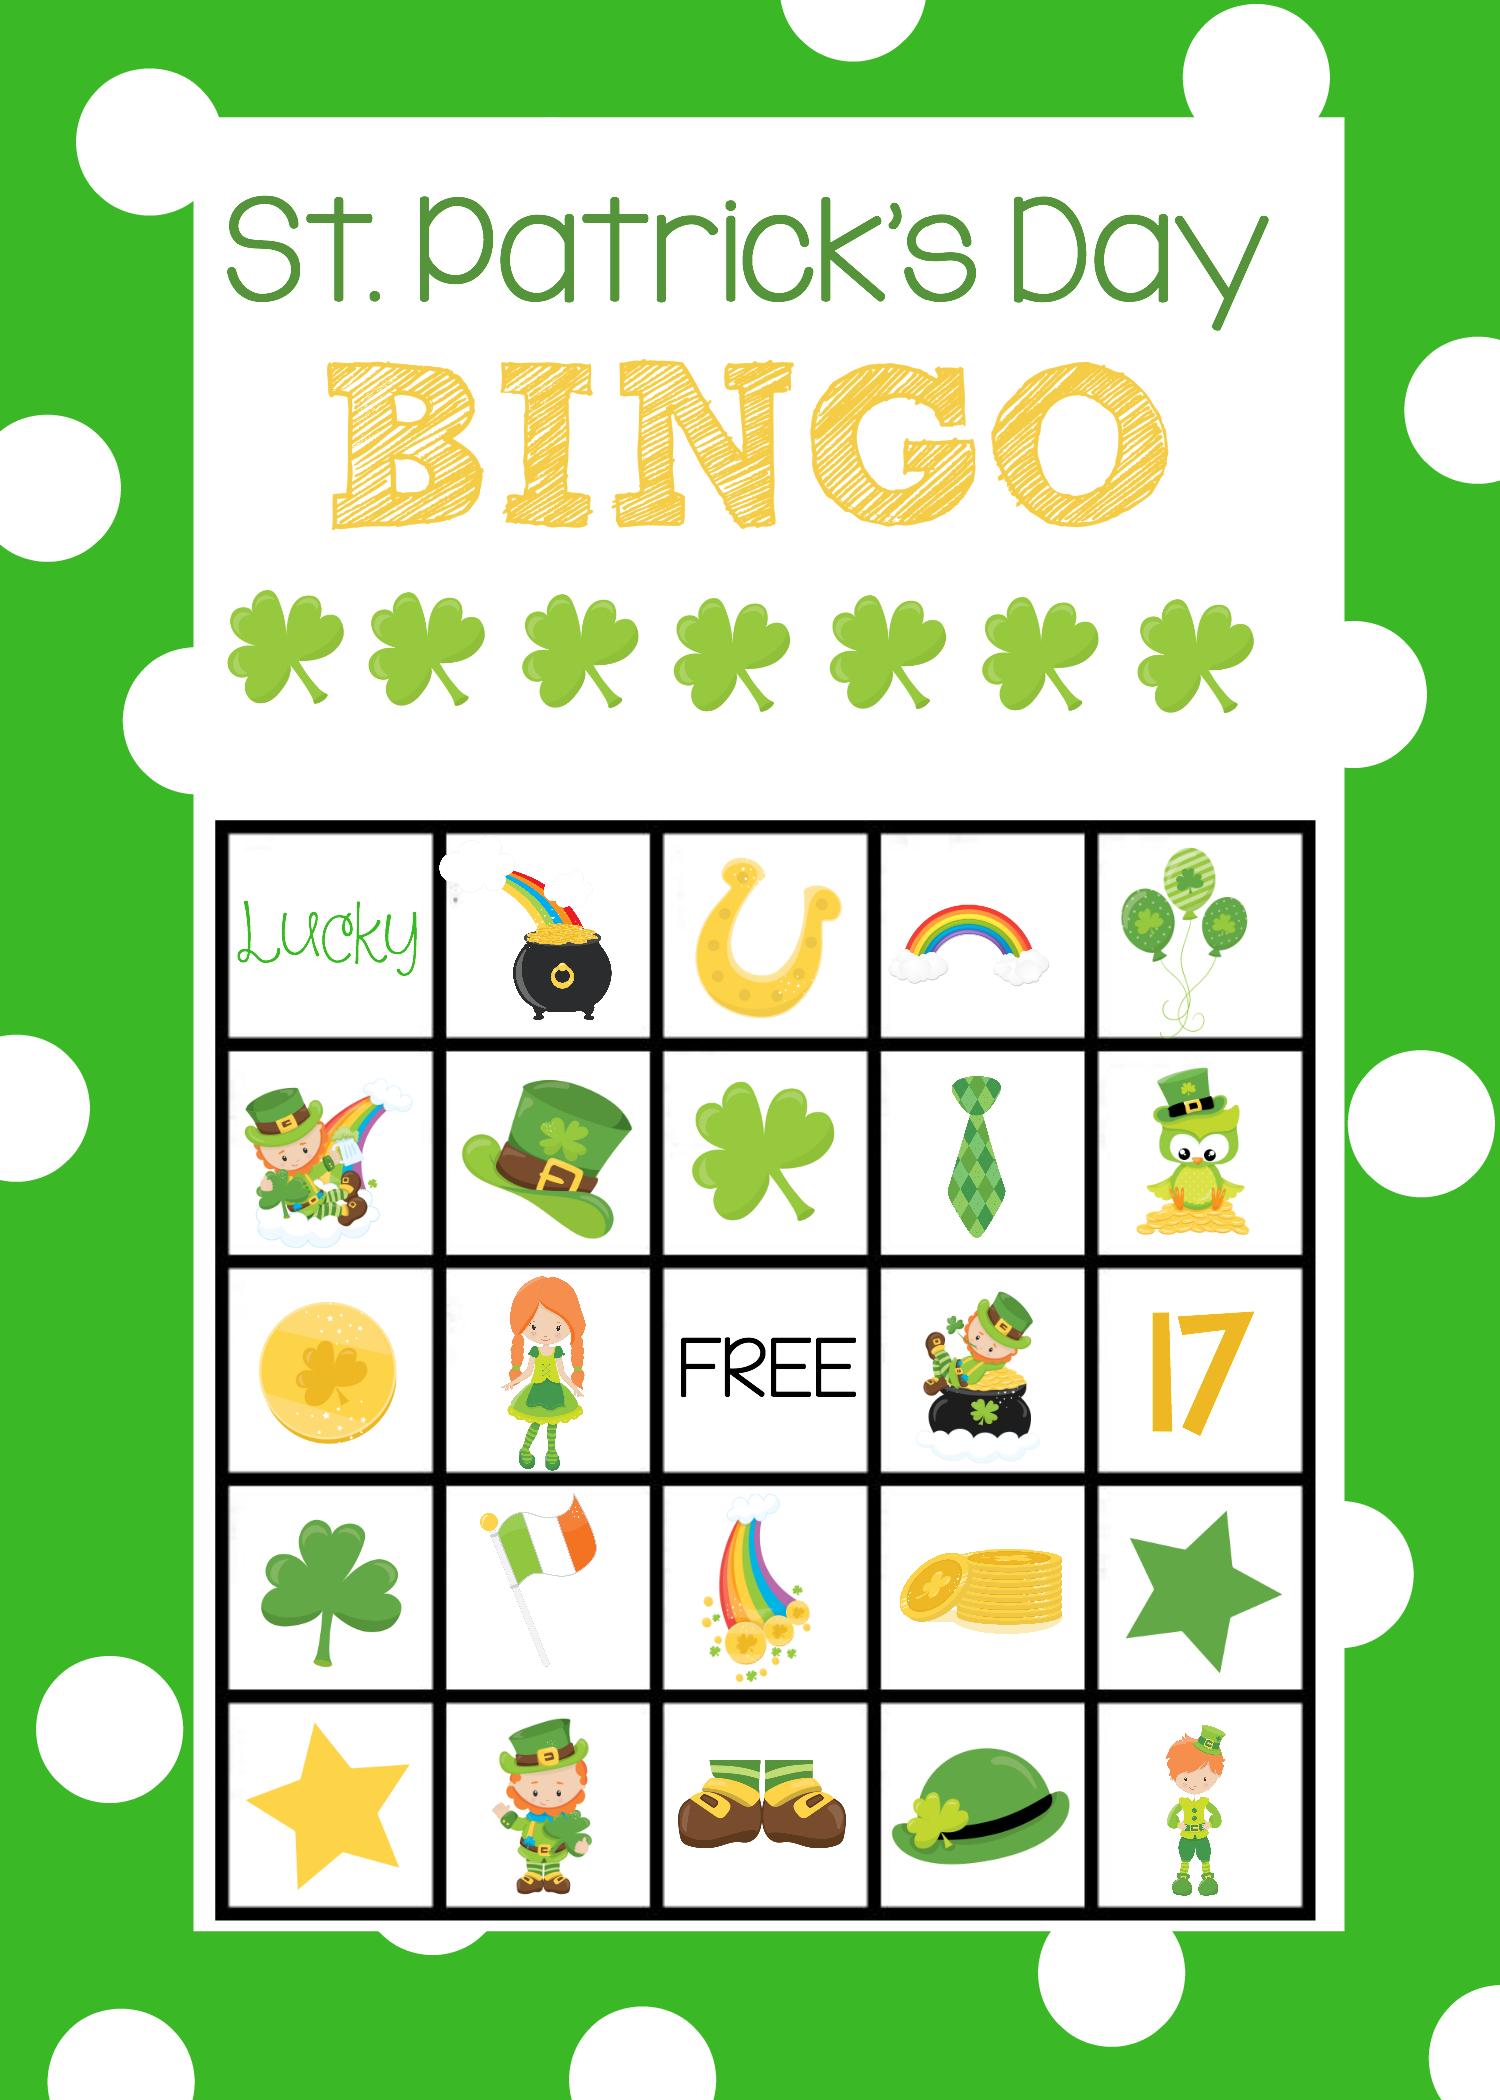 St. Patrick's Day Bingo Game | St Patrick Day Activities, St